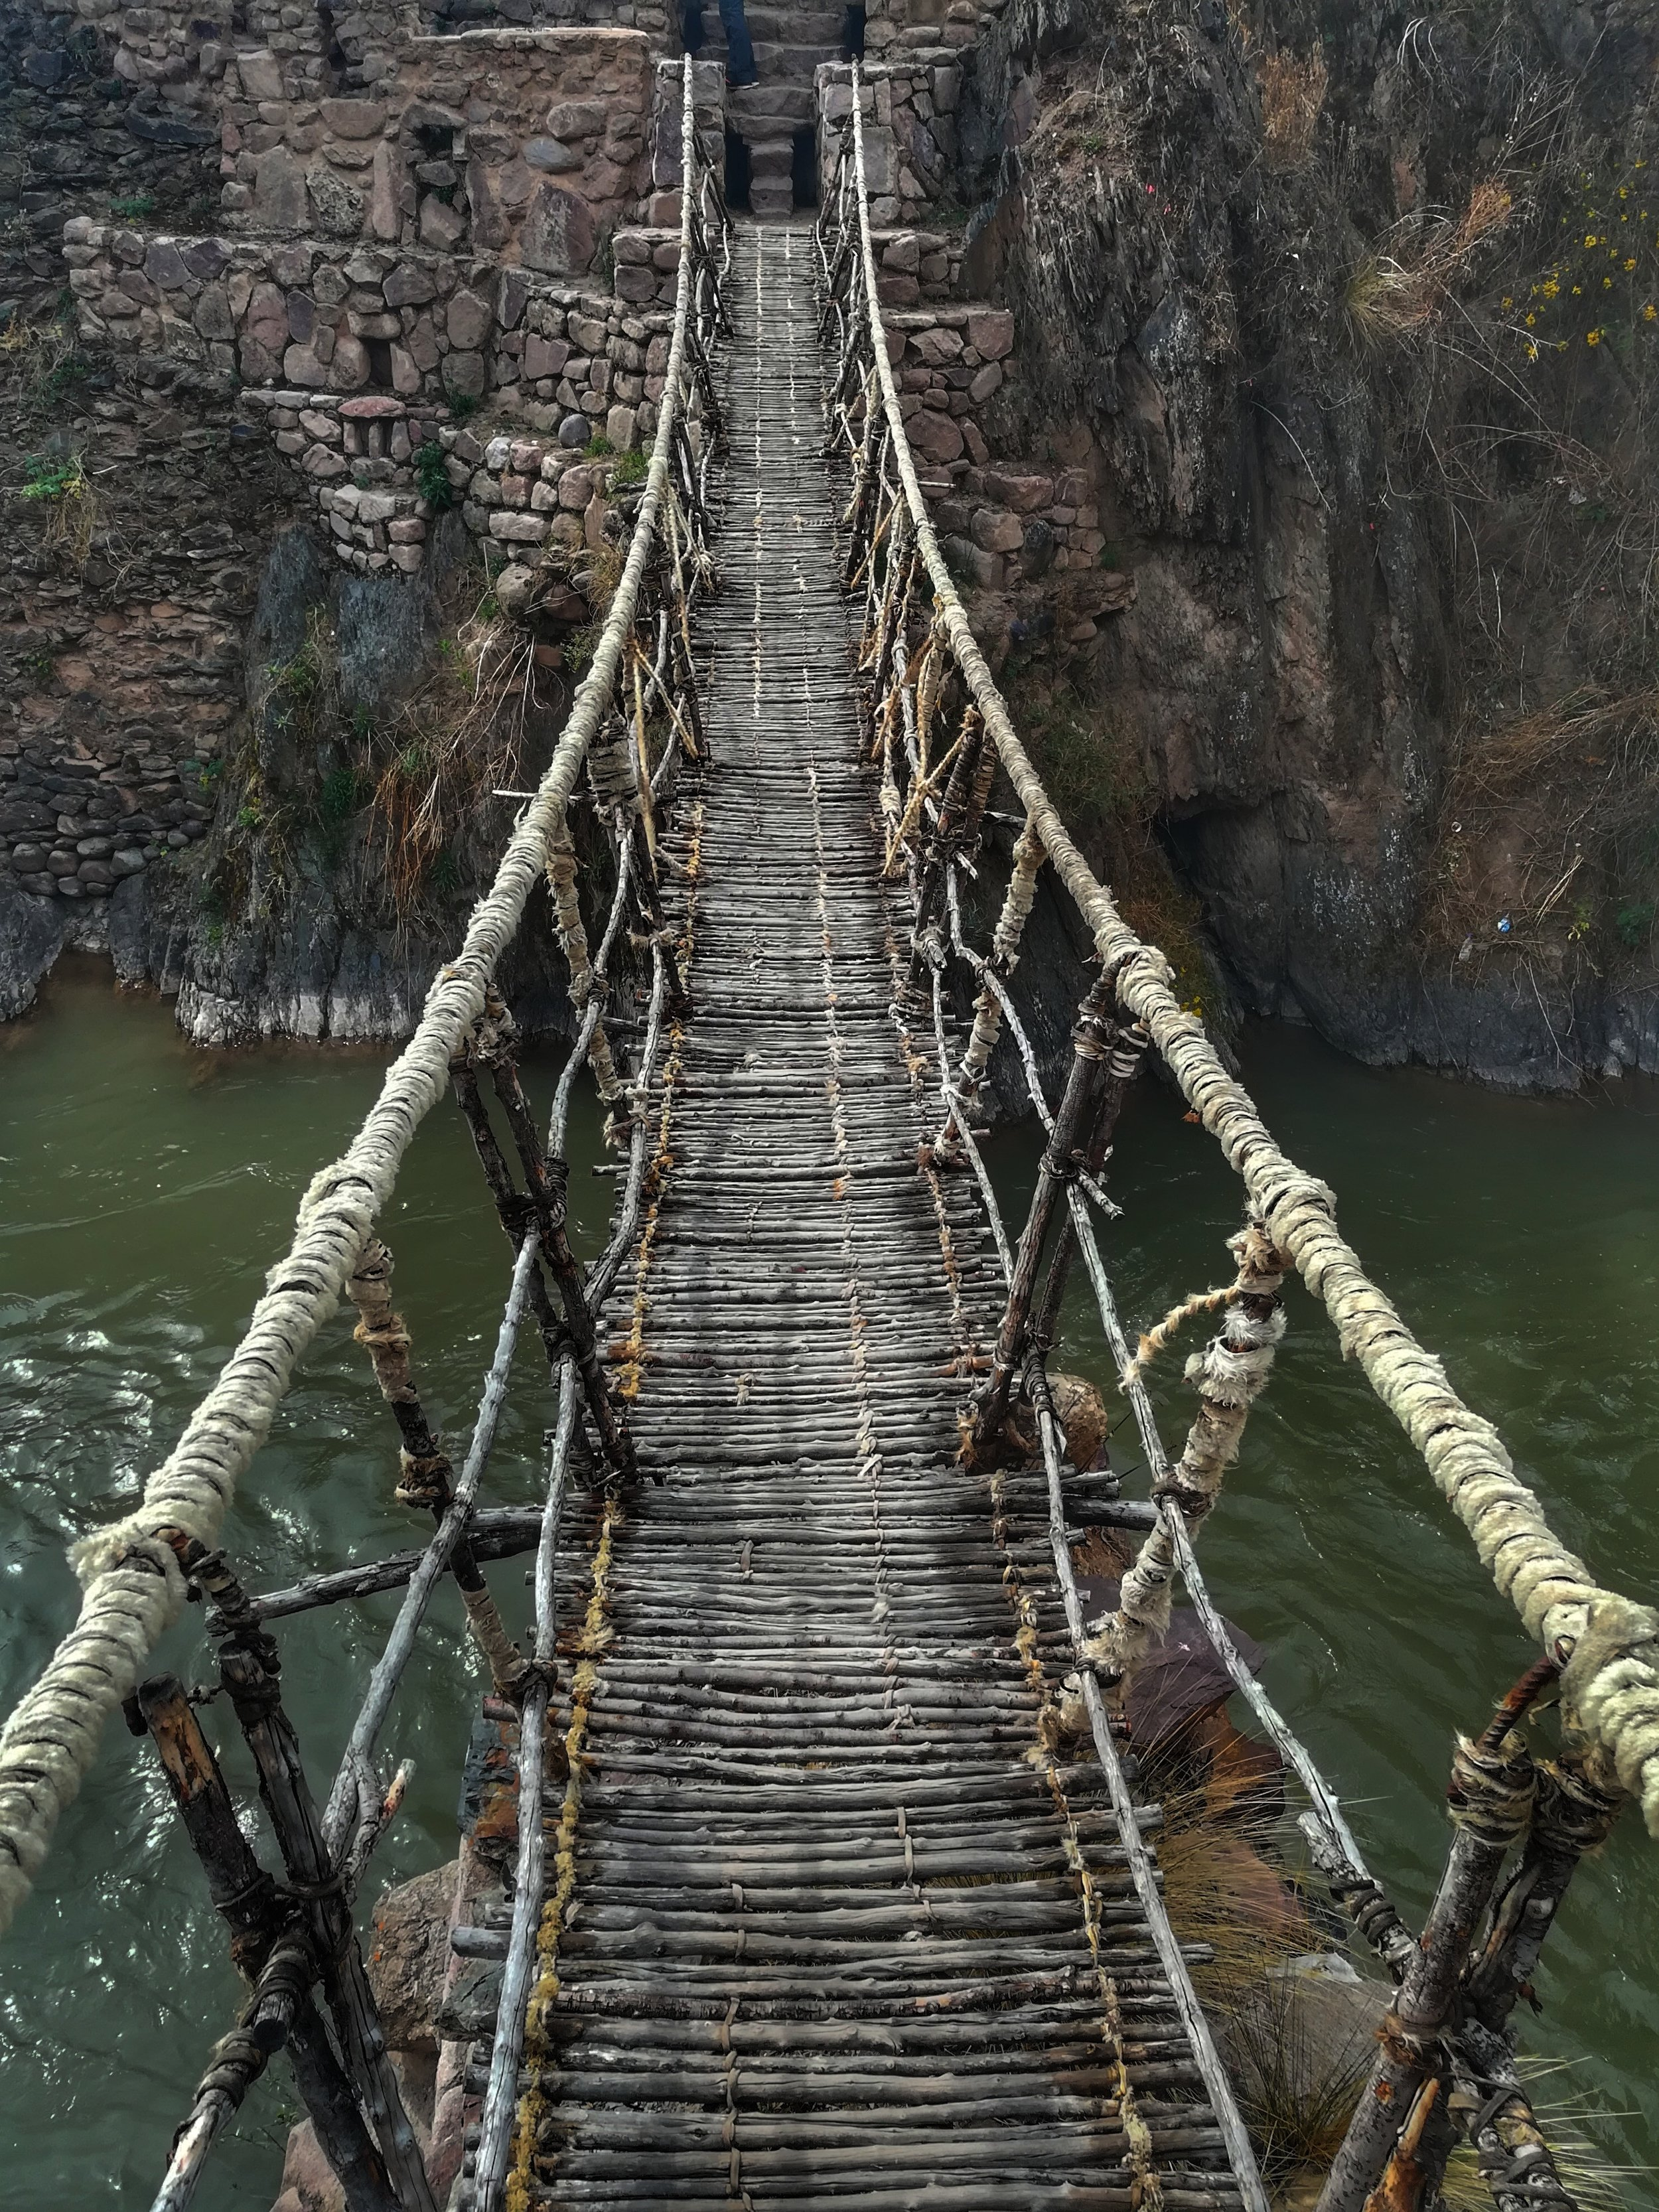 Inca bridge we walked on!